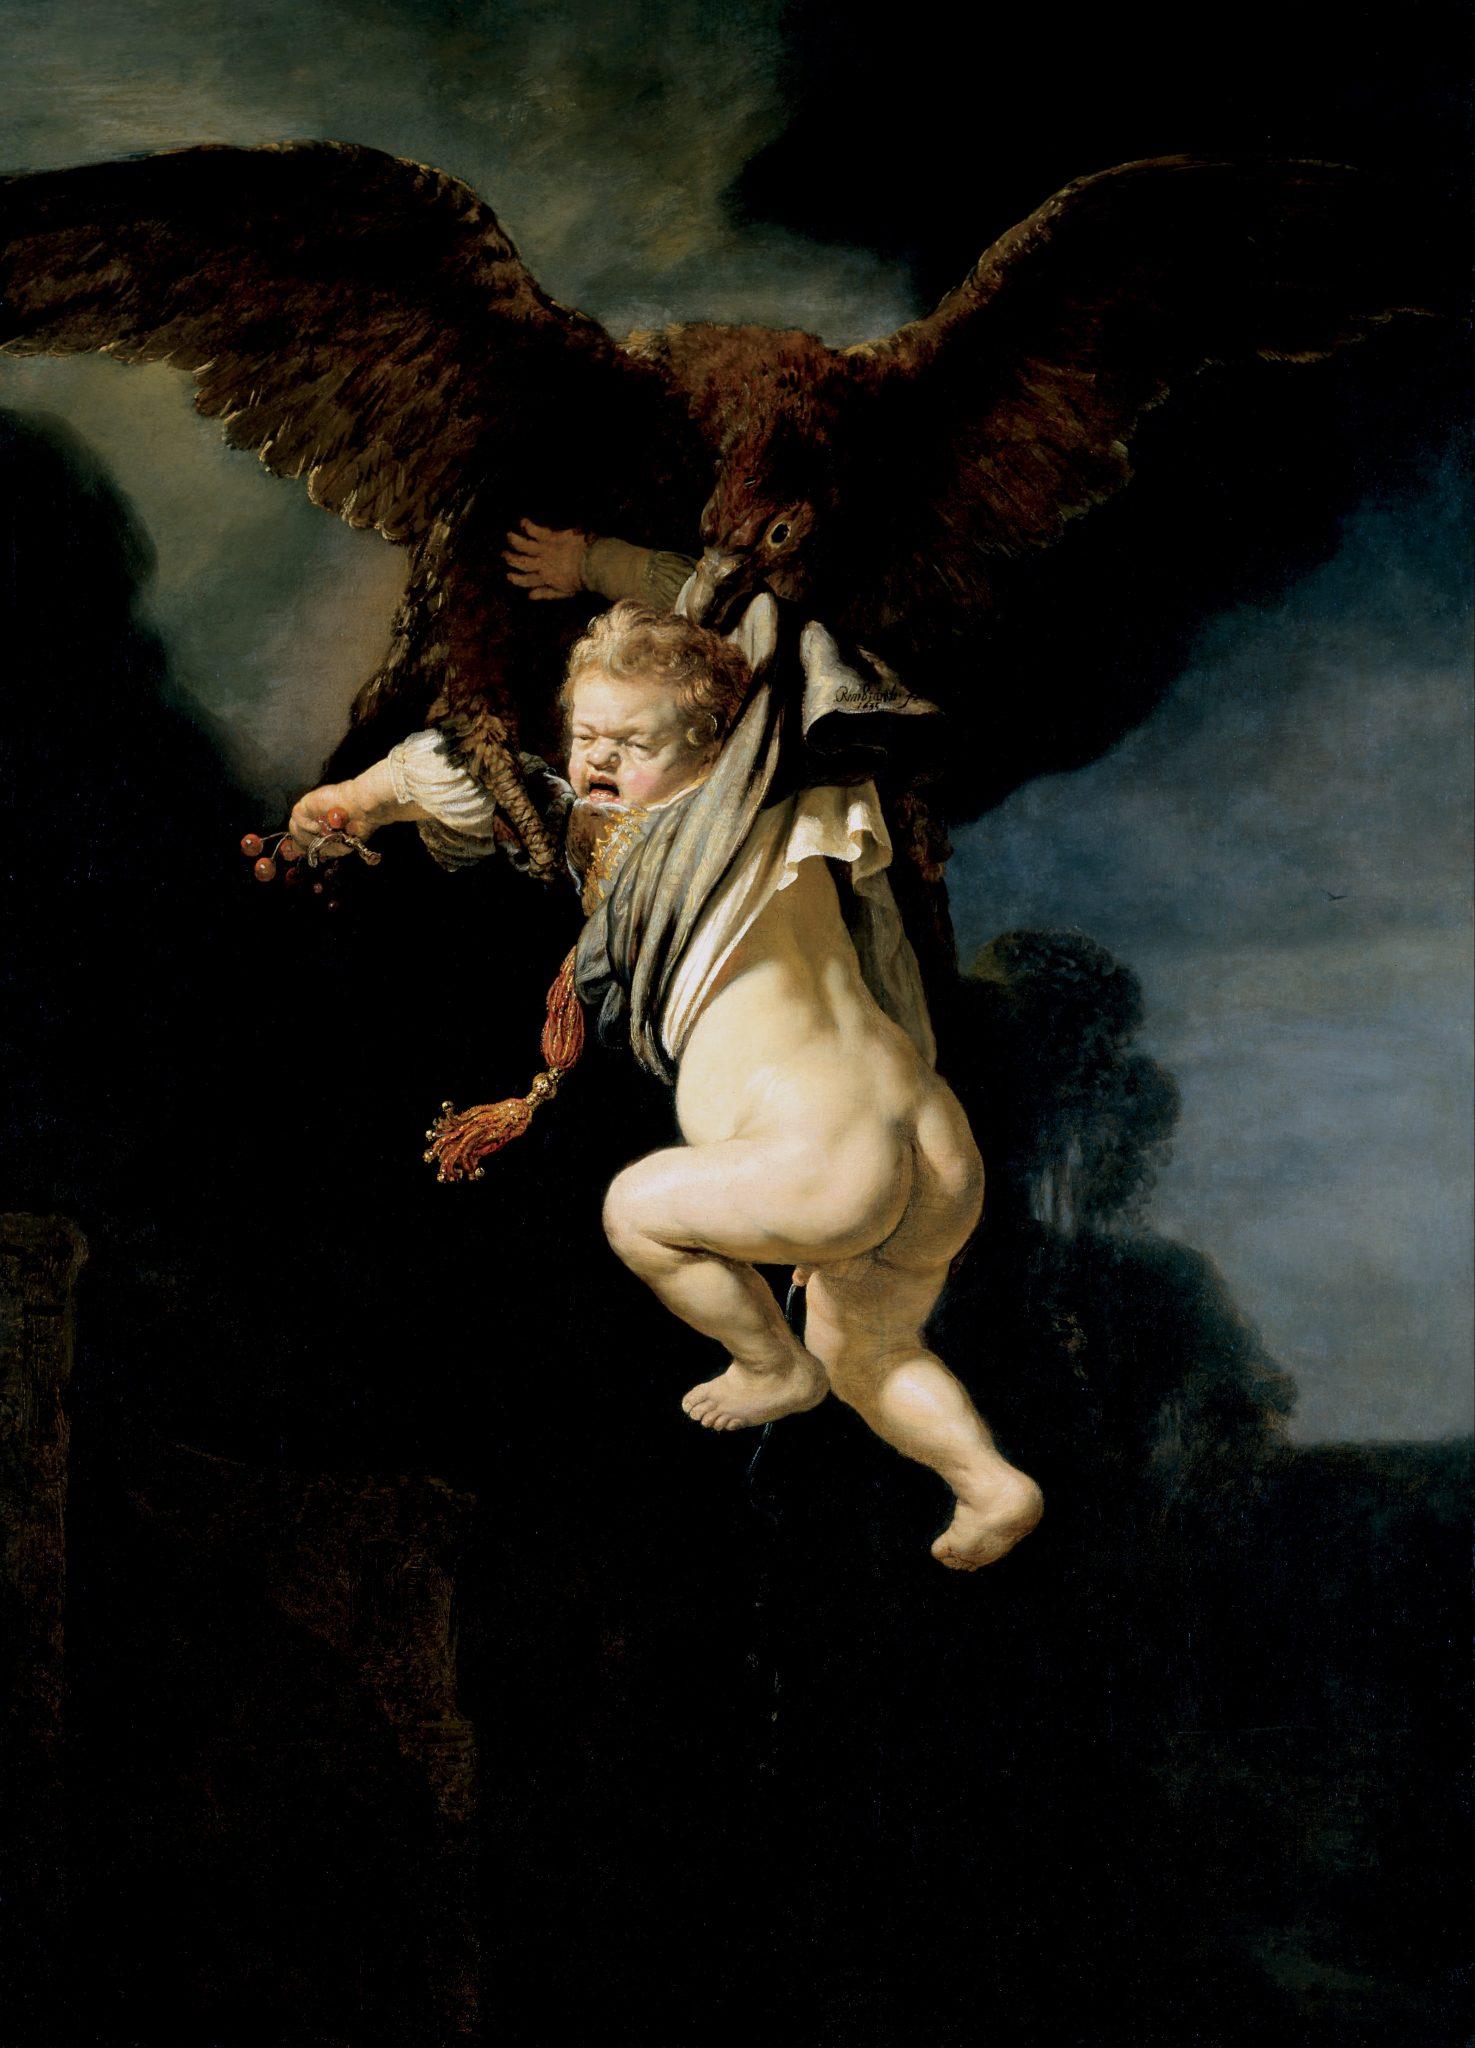 l Ratto di Ganimede Rembrandt - The Abduction of Ganymede - Google Art Project.jpg Autore Rembrandt Harmenszoon Van Rijn Data 1635 Tecnica olio su tela Dimensioni 177×130 cm Ubicazione Staatliche Kunstsammlungen, Dresda